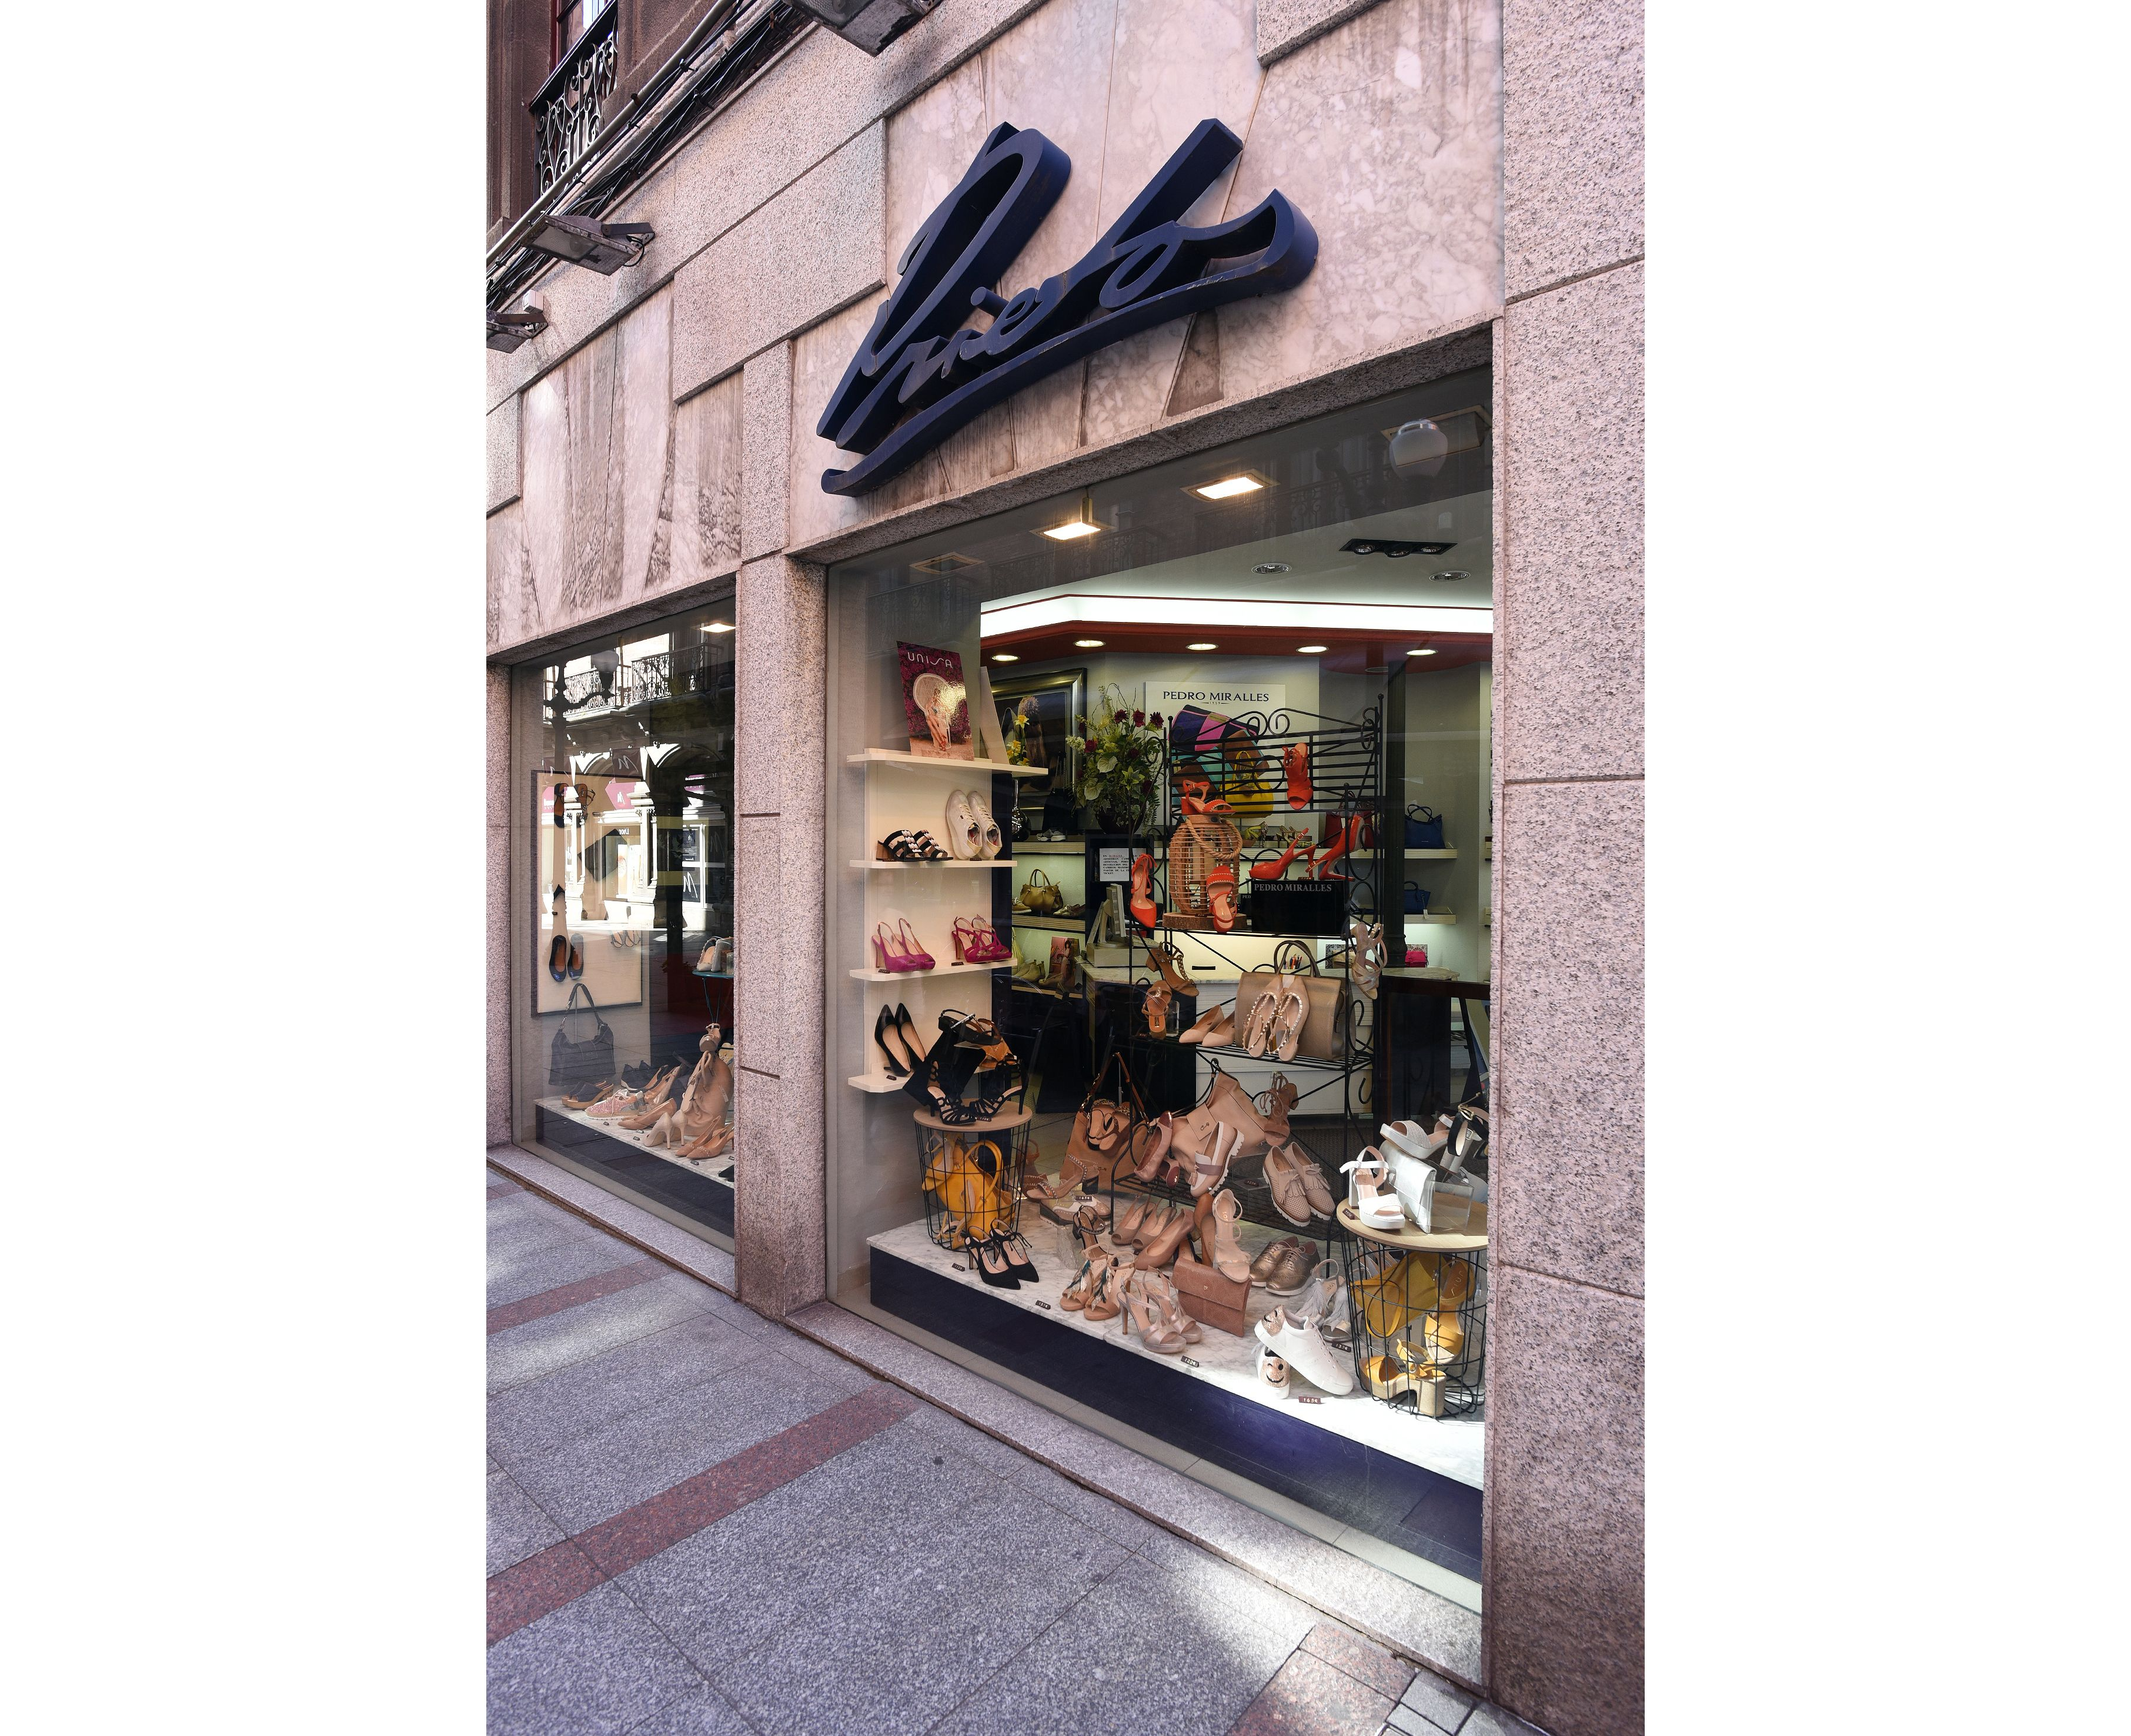 Calzados Piretos, Gijón